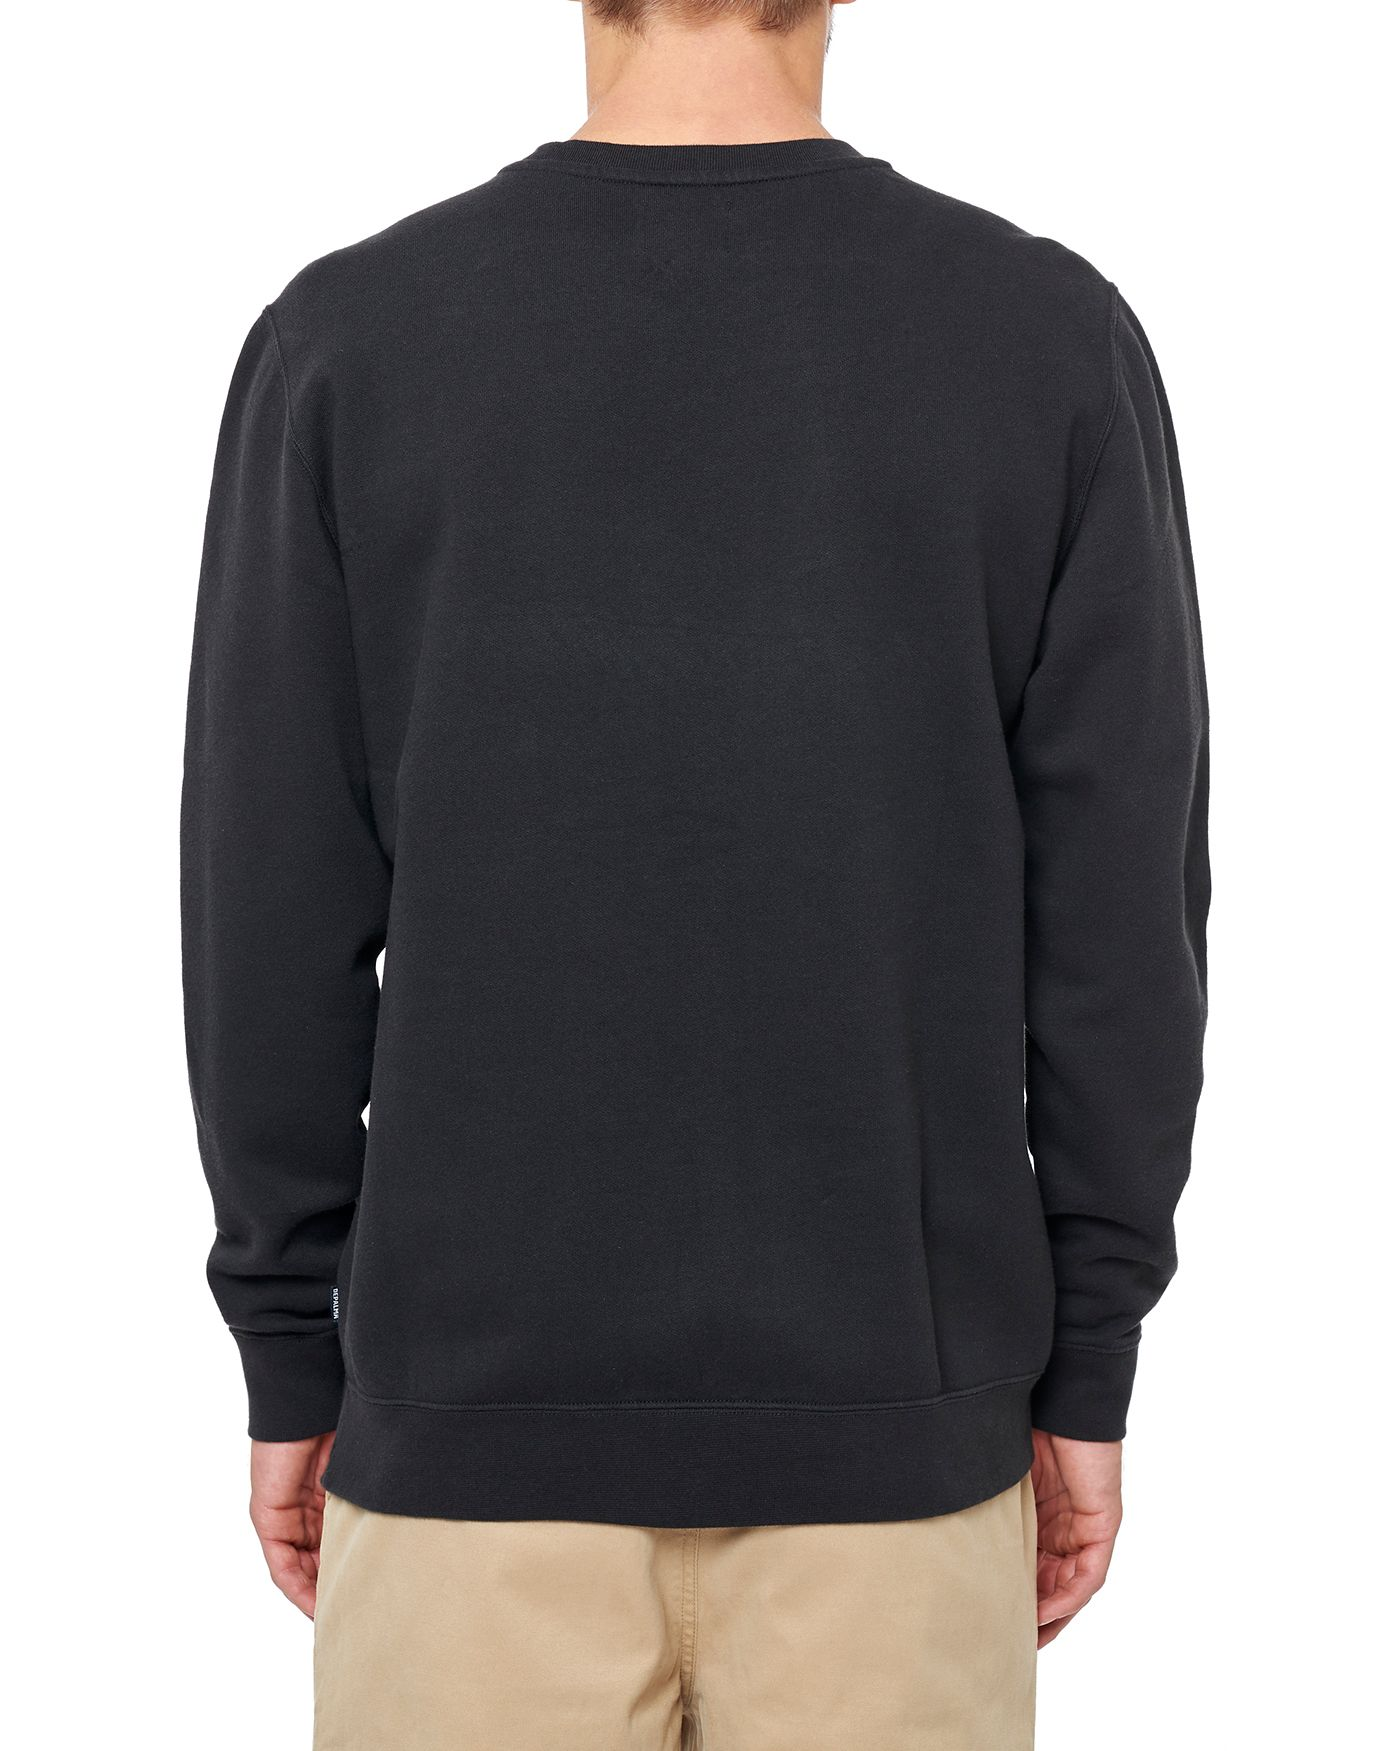 Photo of Handlebars Crewneck Sweatshirt, Black